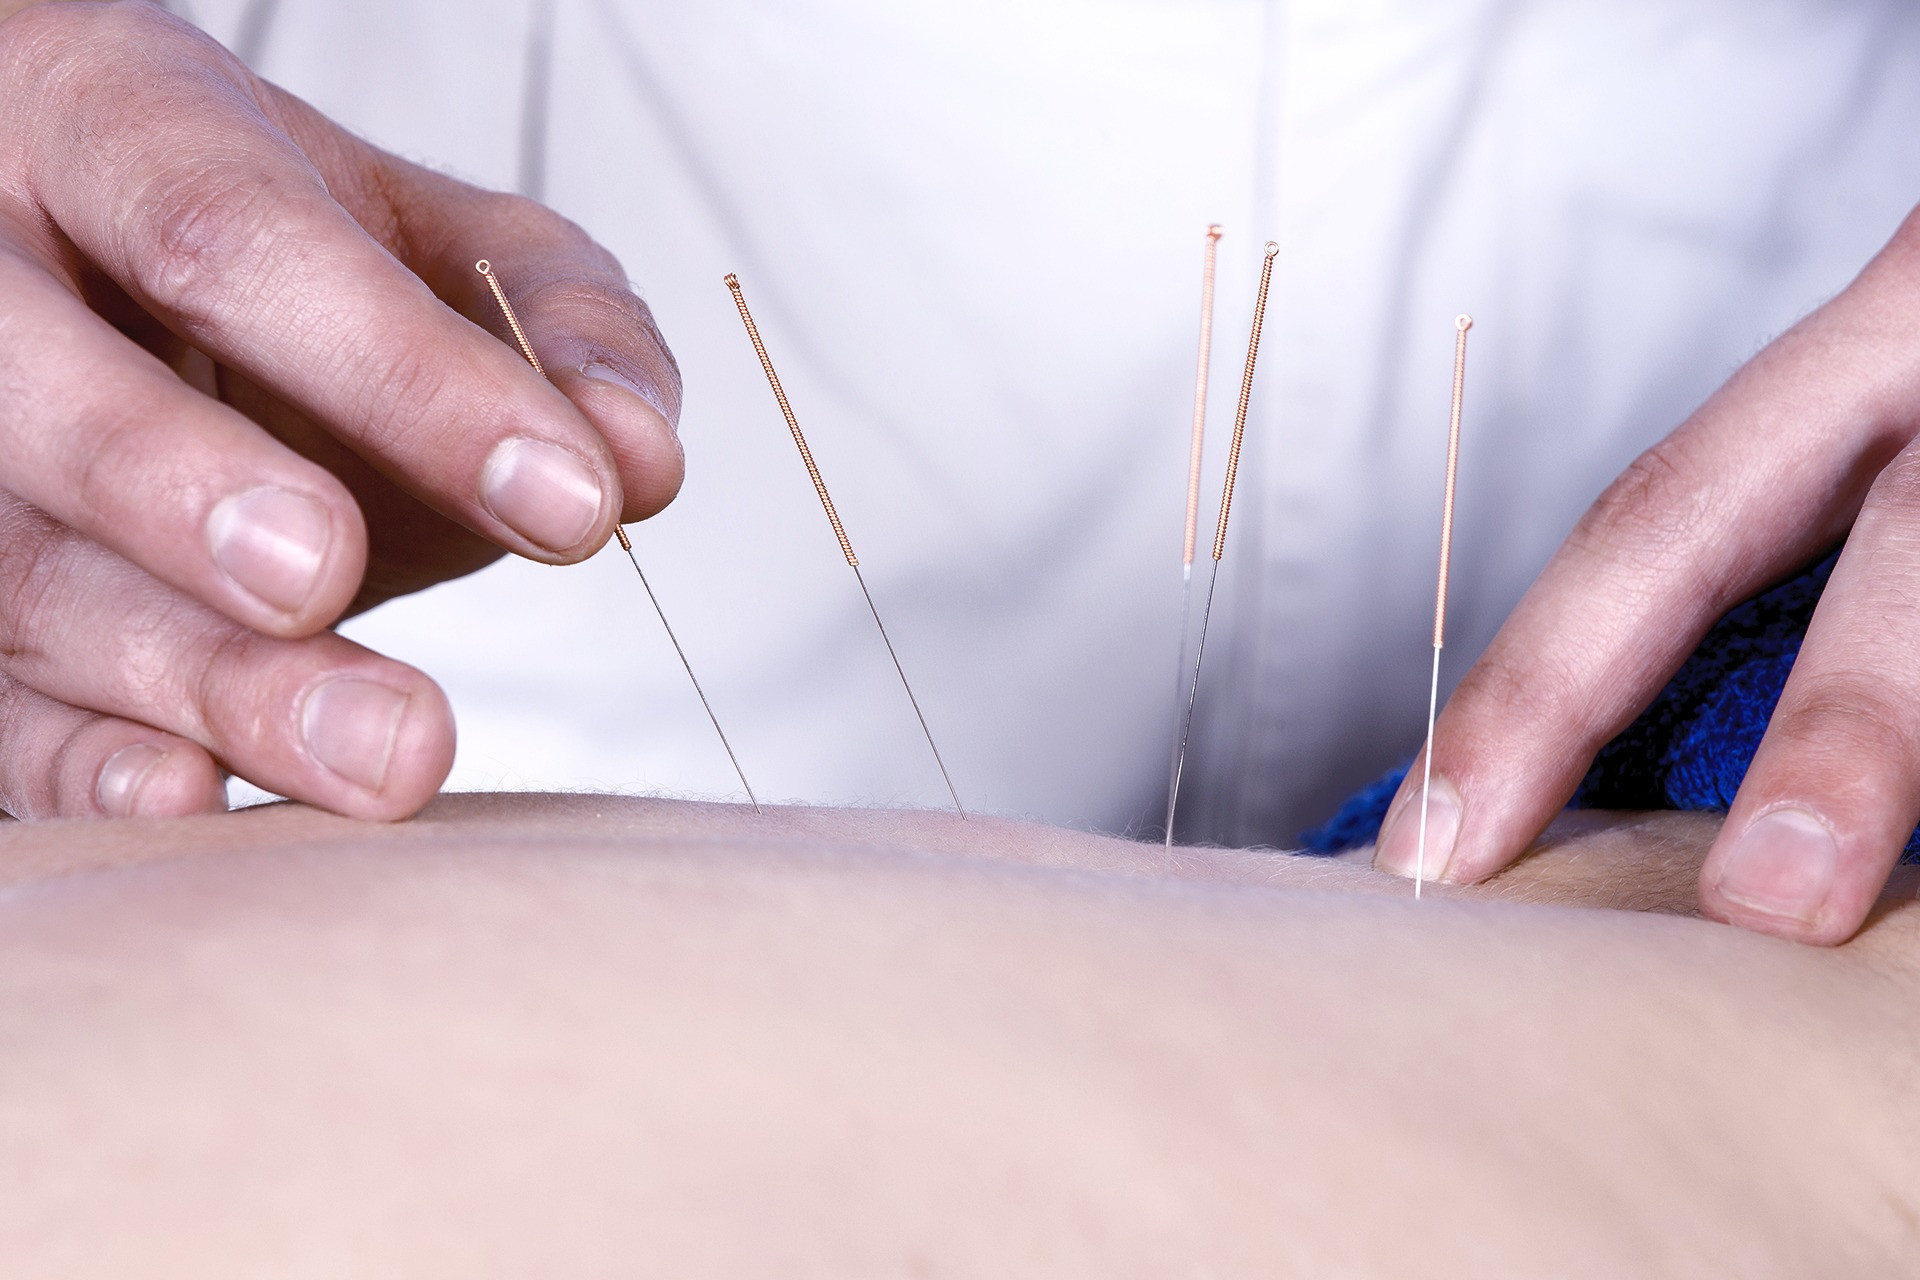 Acupuncture Session - Ketchum (50 min)